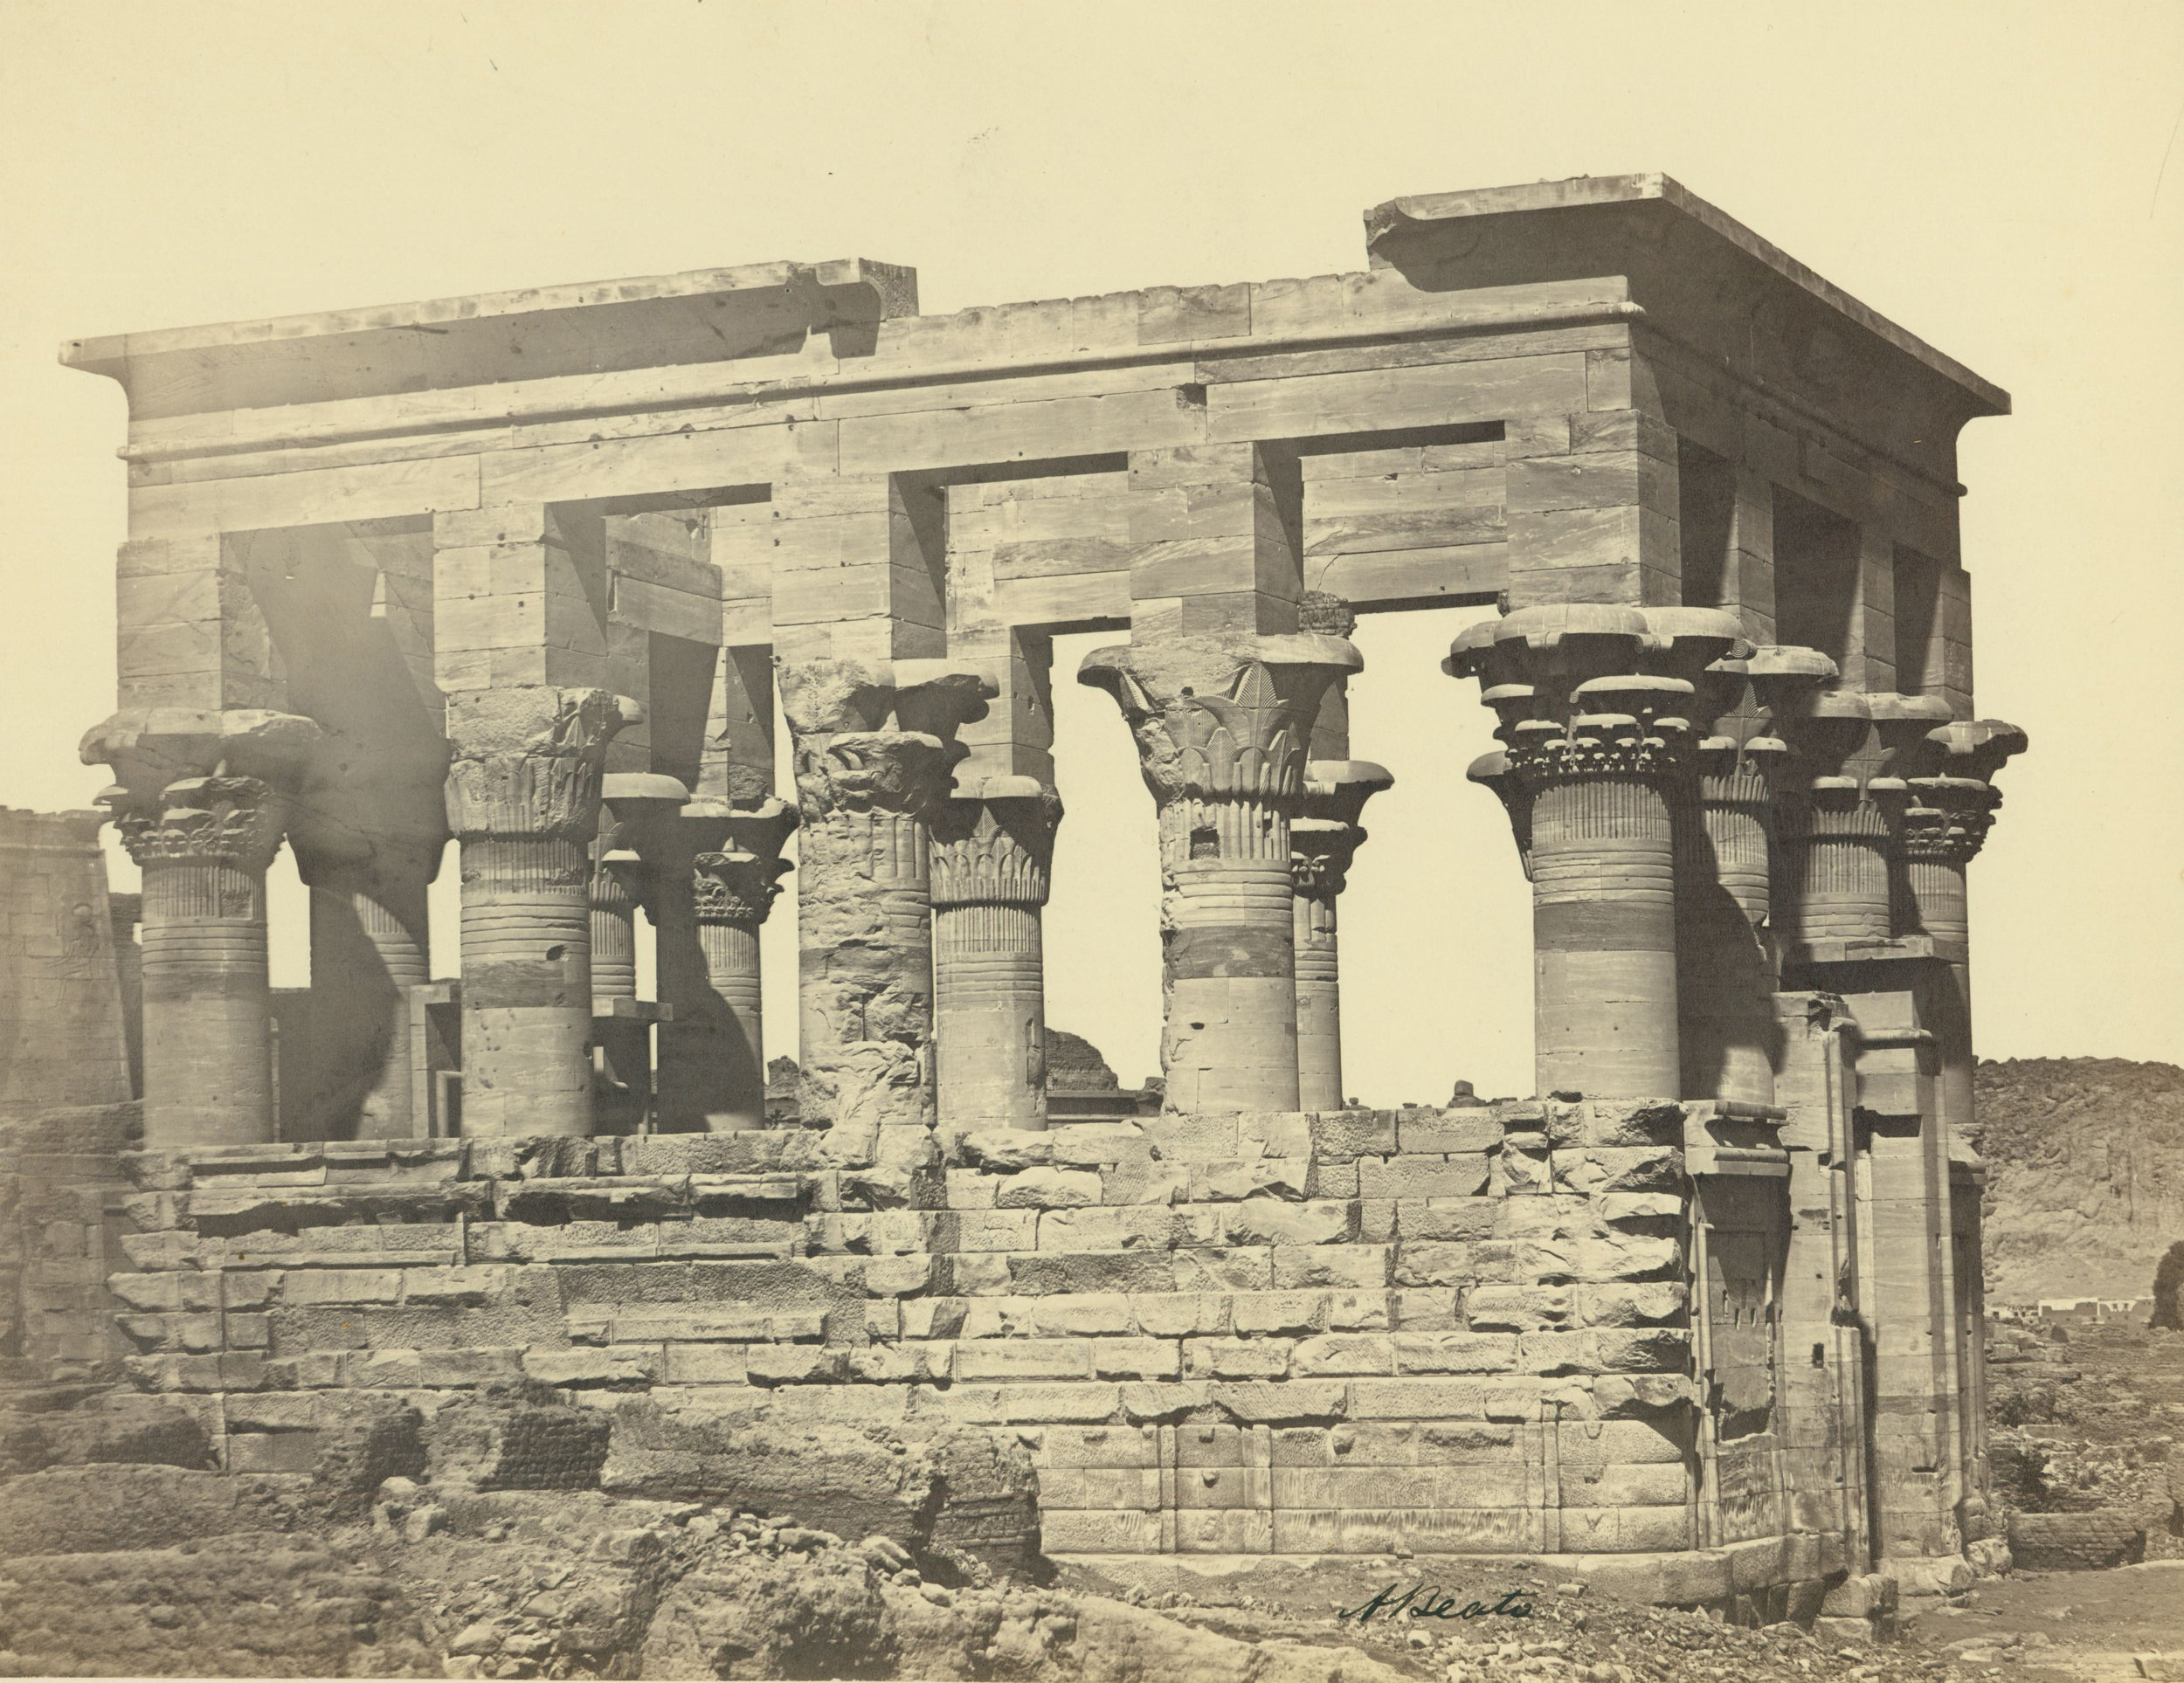 ANTONIO BEATO,  Trajan's Kioski, or Pharaoh's Bed,   Island of Philae, Egypt  c. 1887